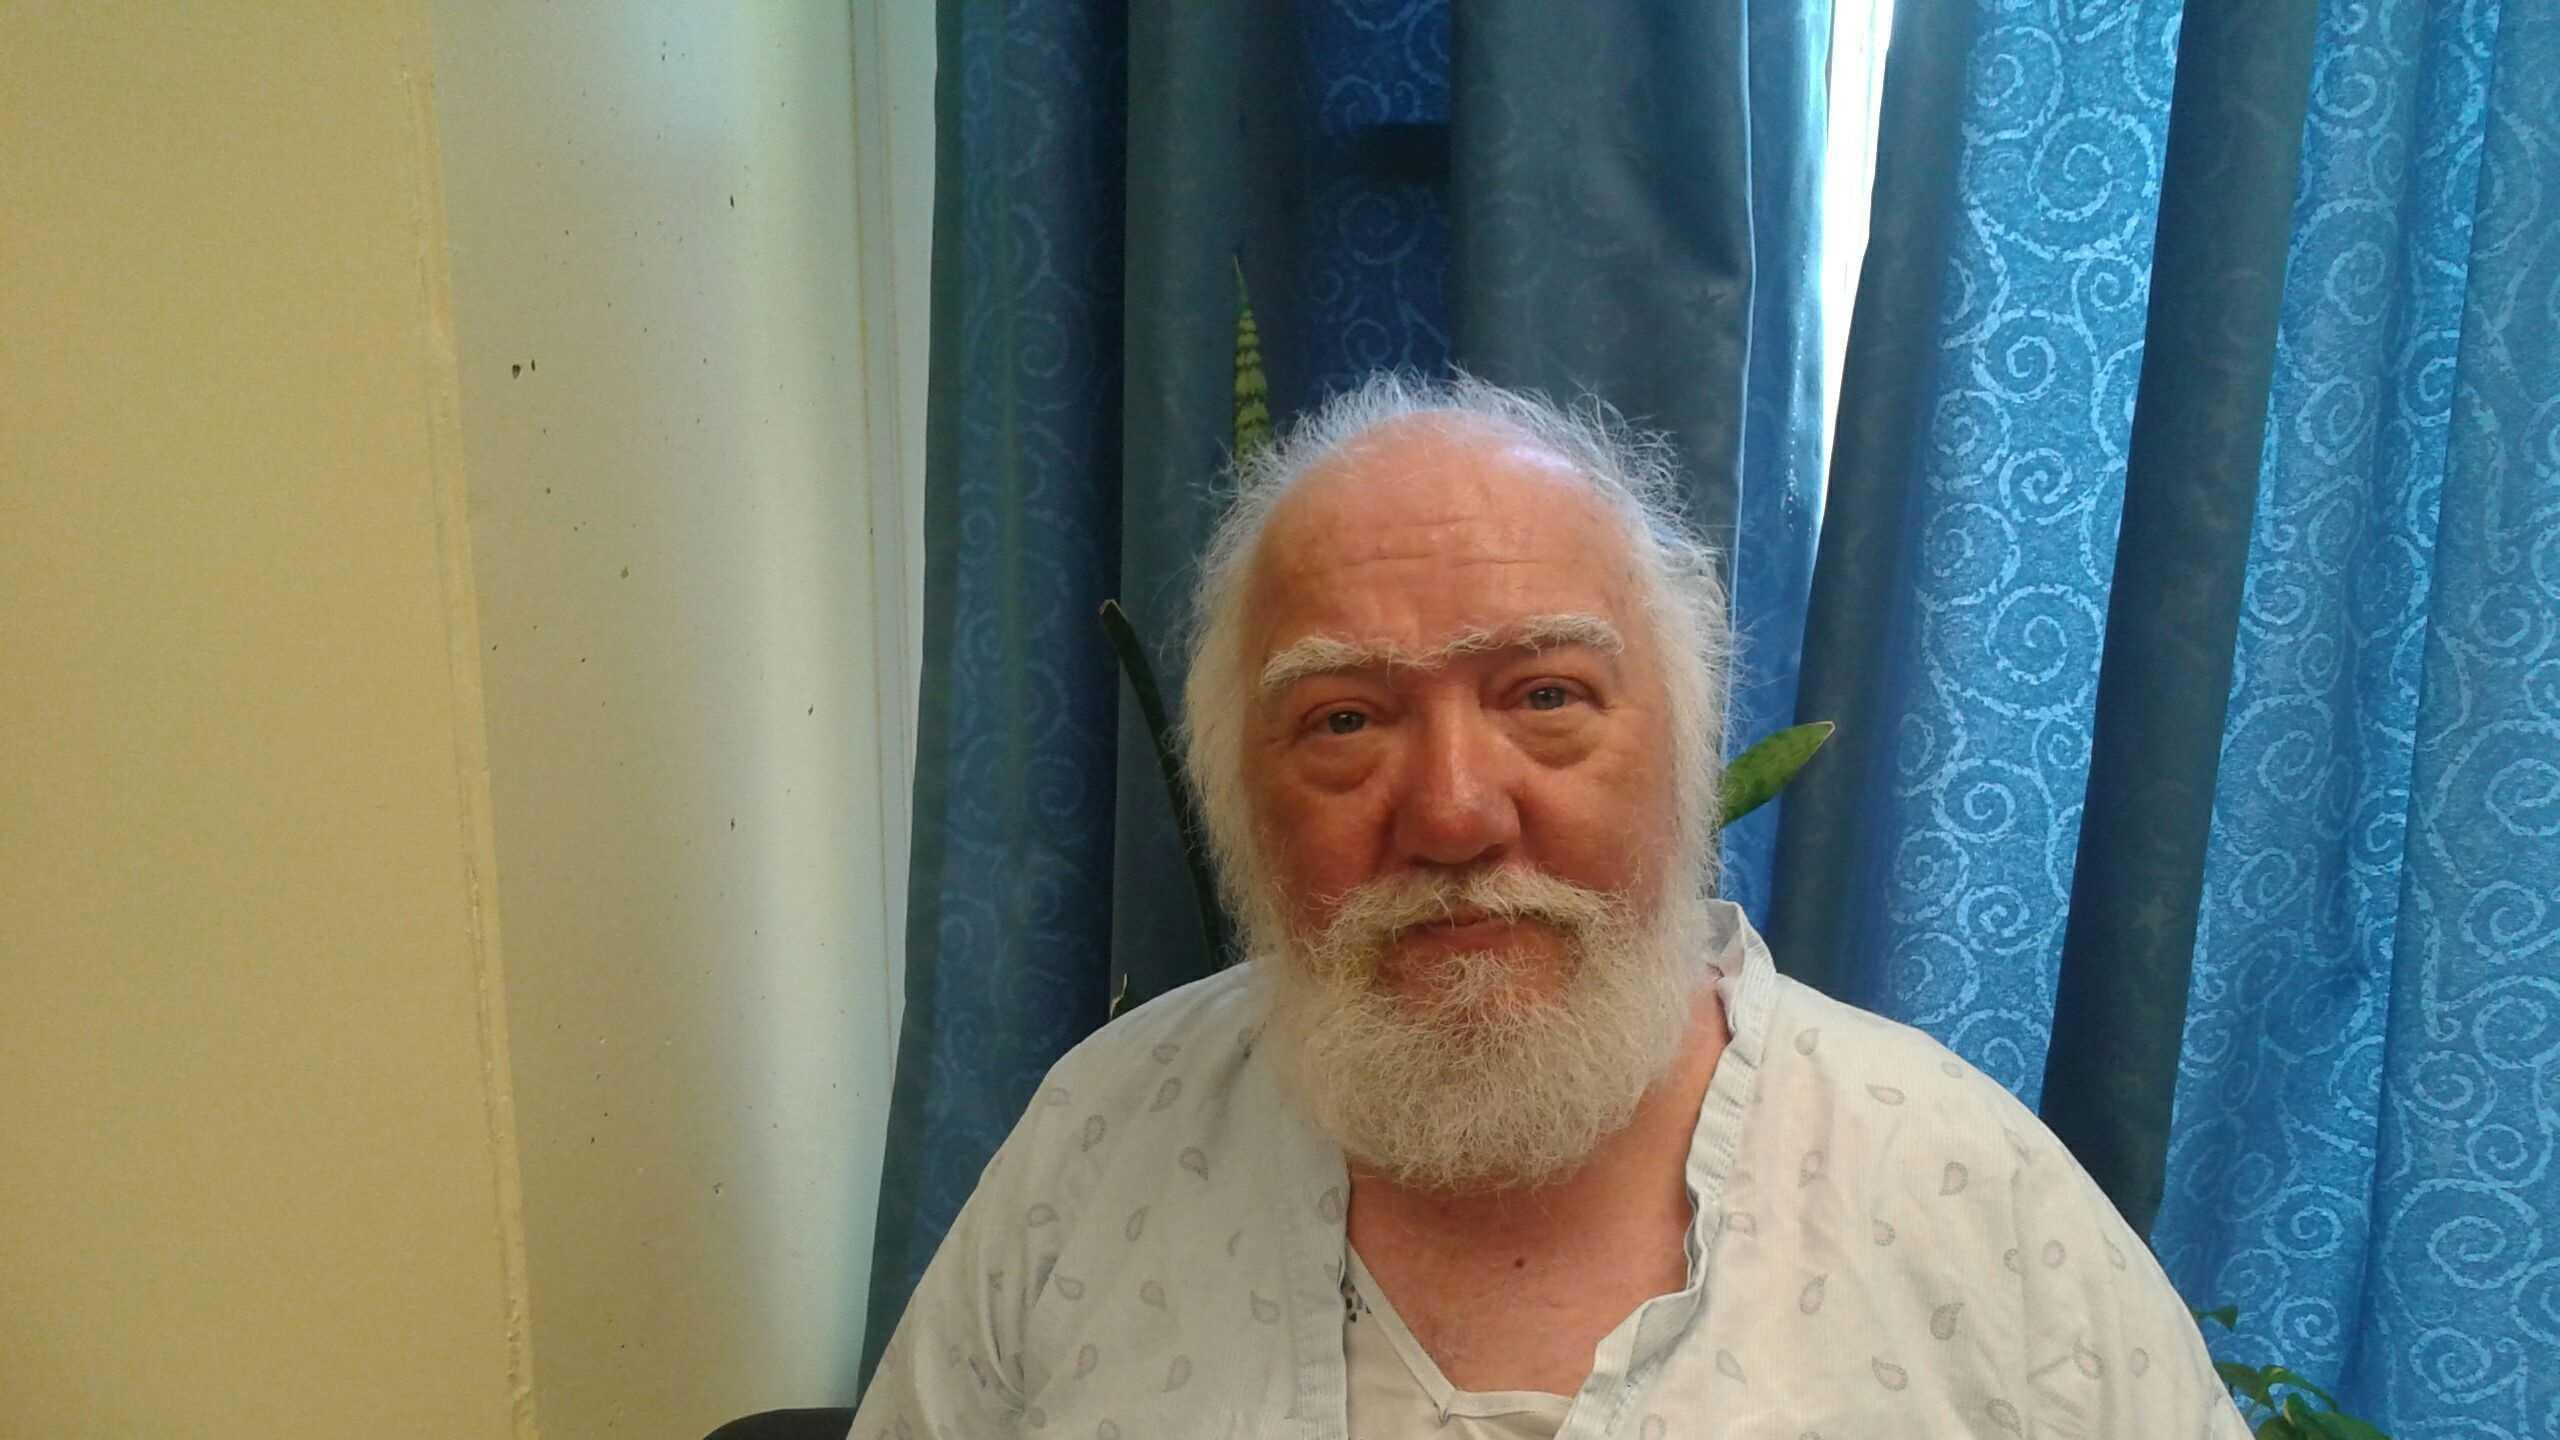 Paul Lessard in Hospital